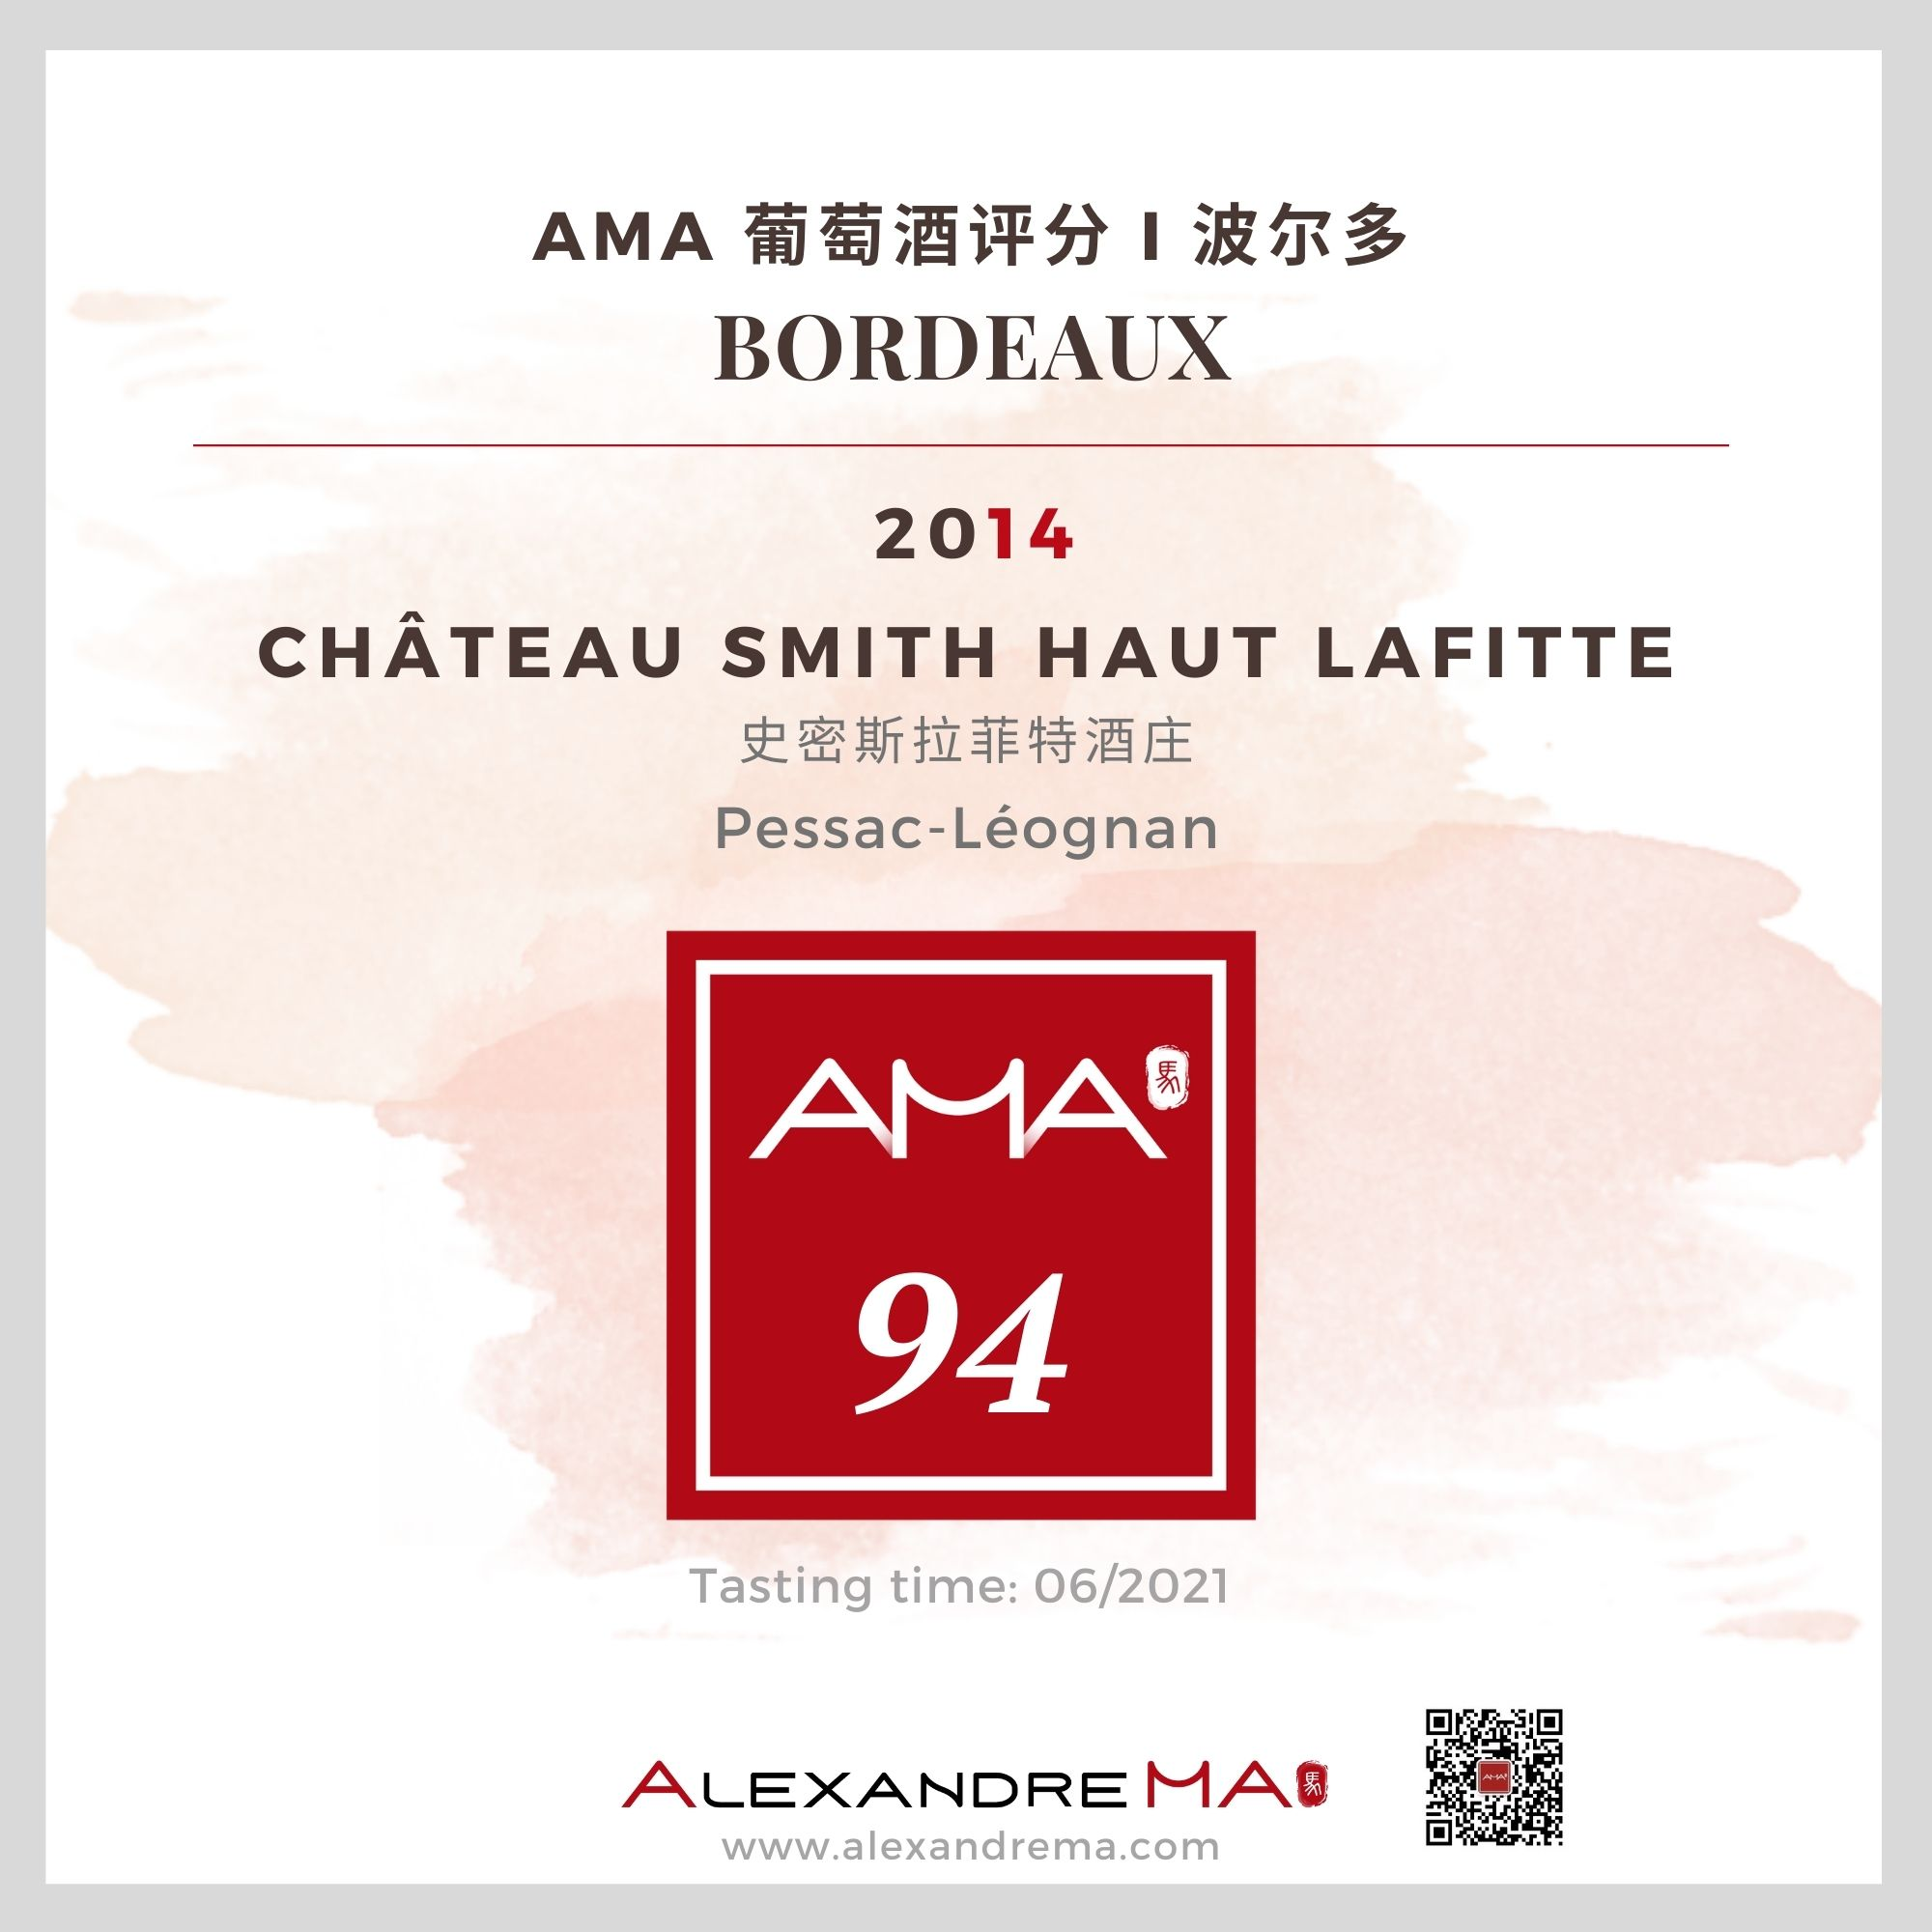 Château Smith Haut Lafitte 2014 史密斯拉菲特酒庄 - Alexandre Ma